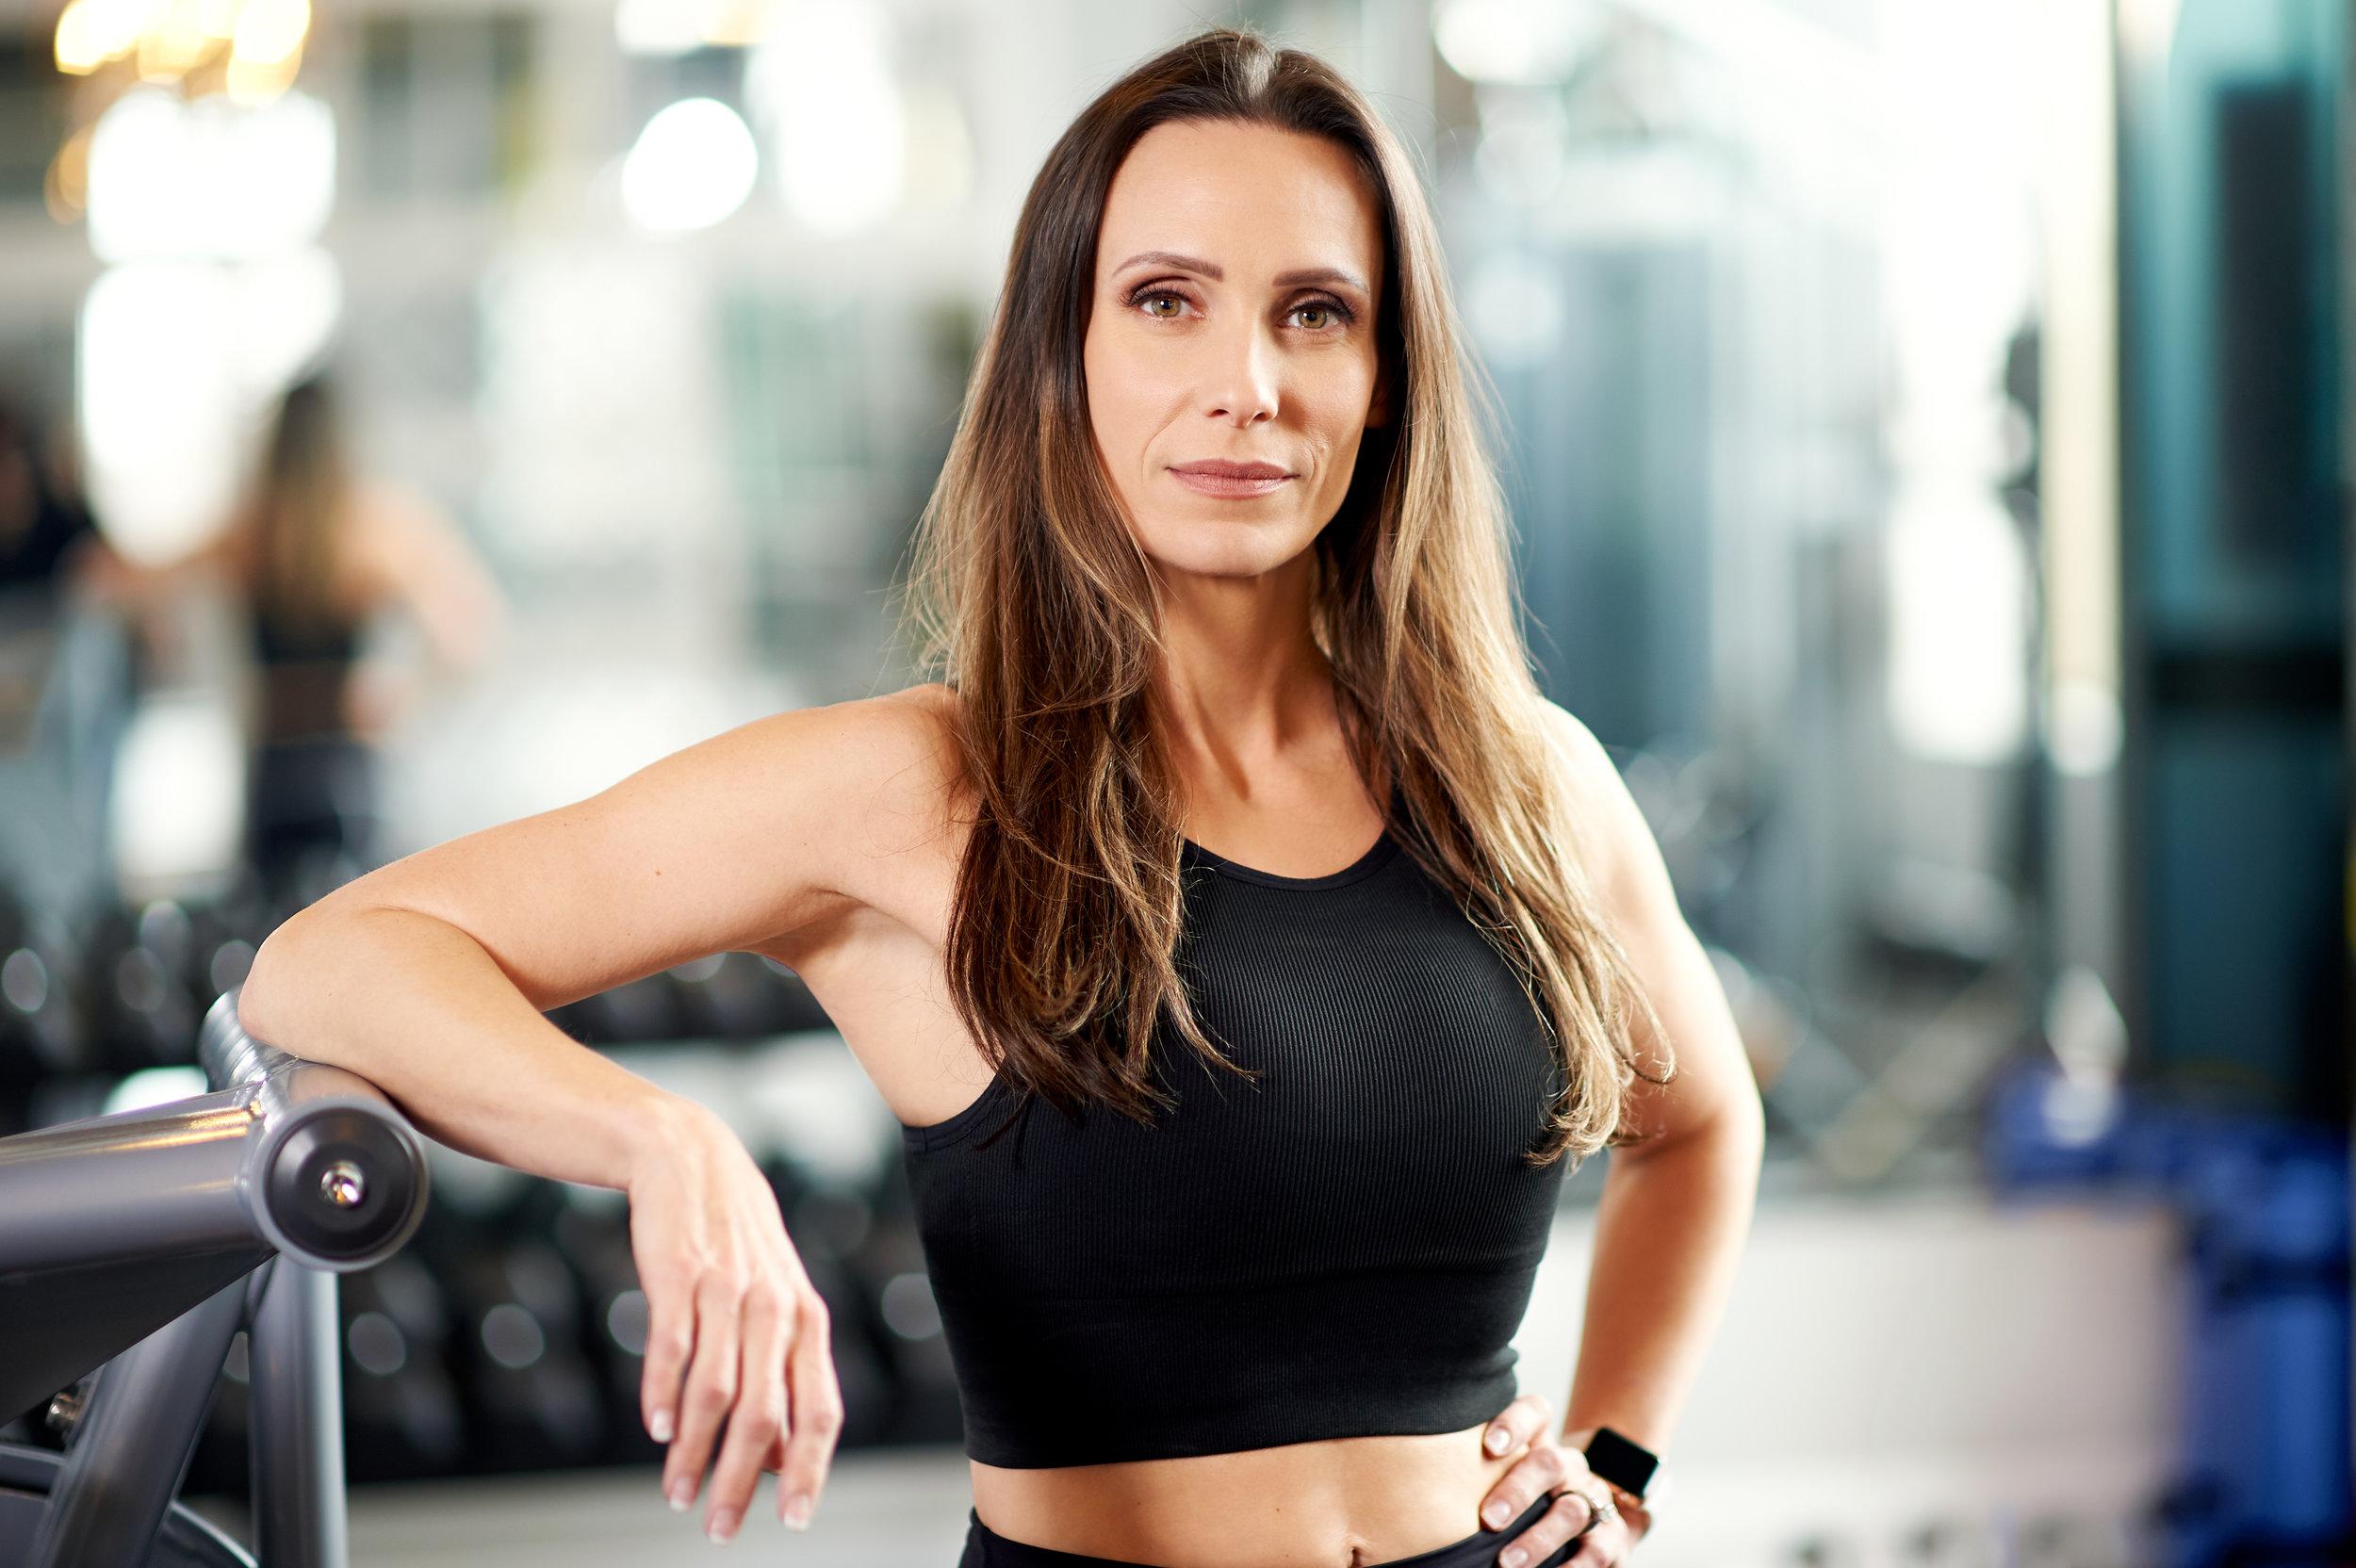 marta-hewson-lisa-poshni-gym-action-shots-5213.jpg